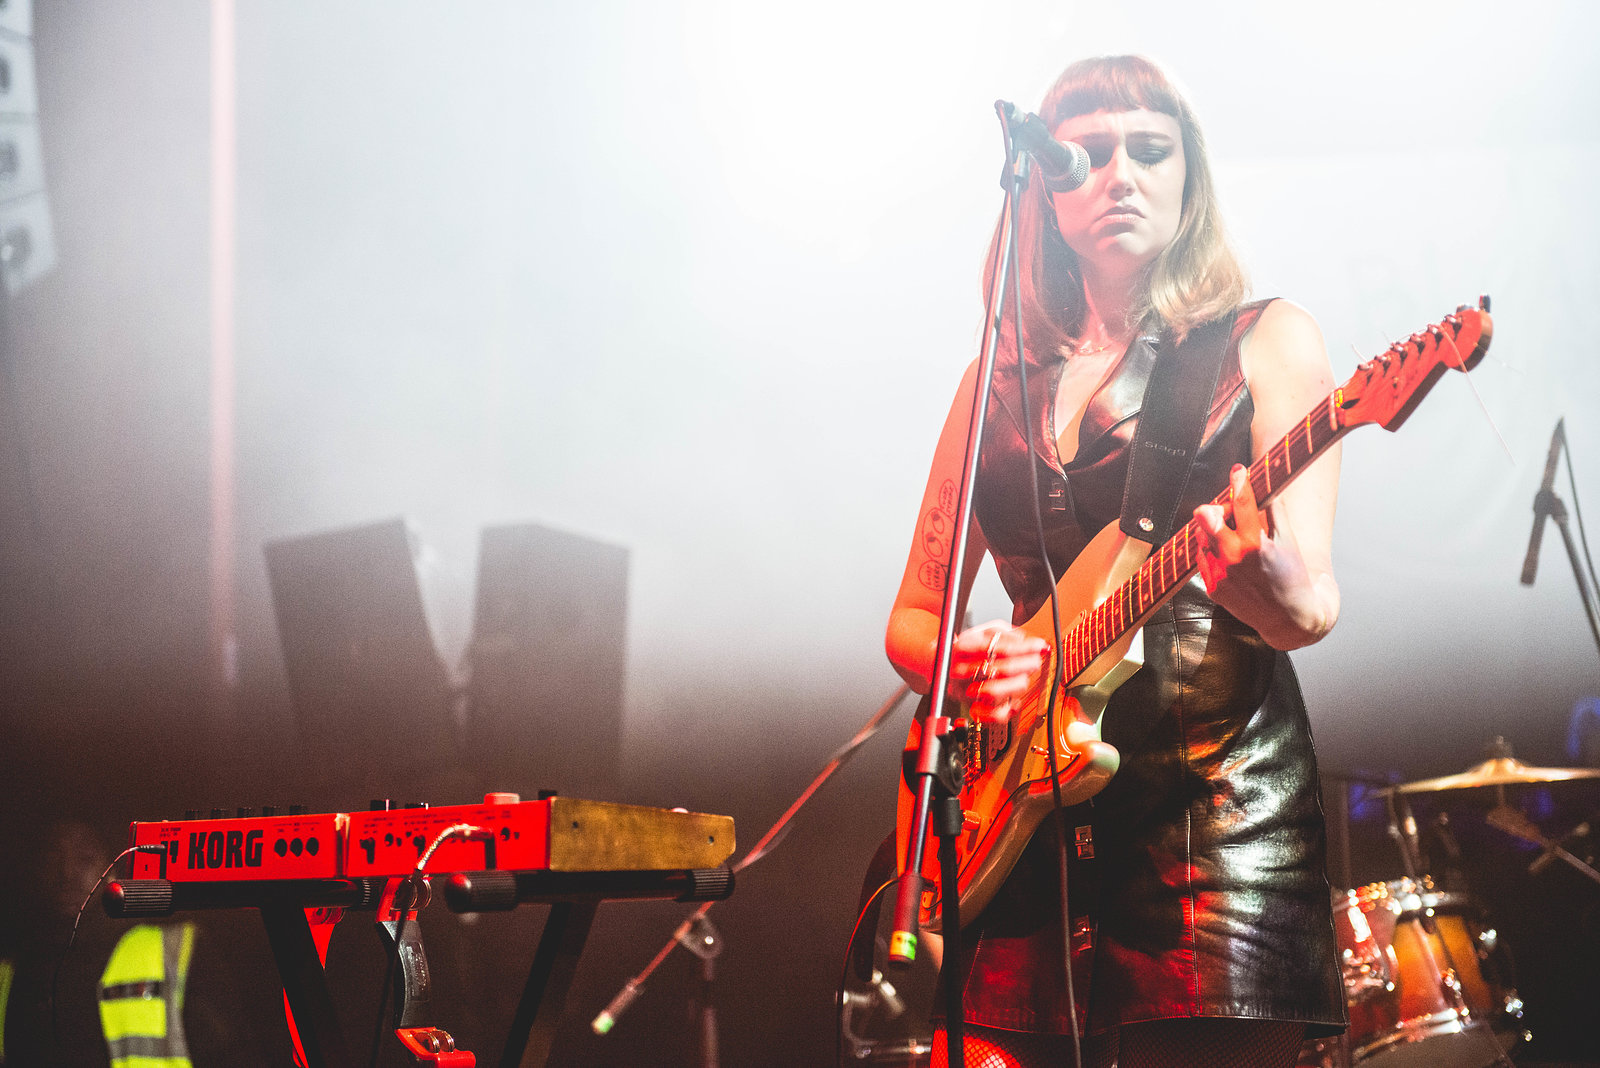 Madonnatron at The Coronet, November 2017